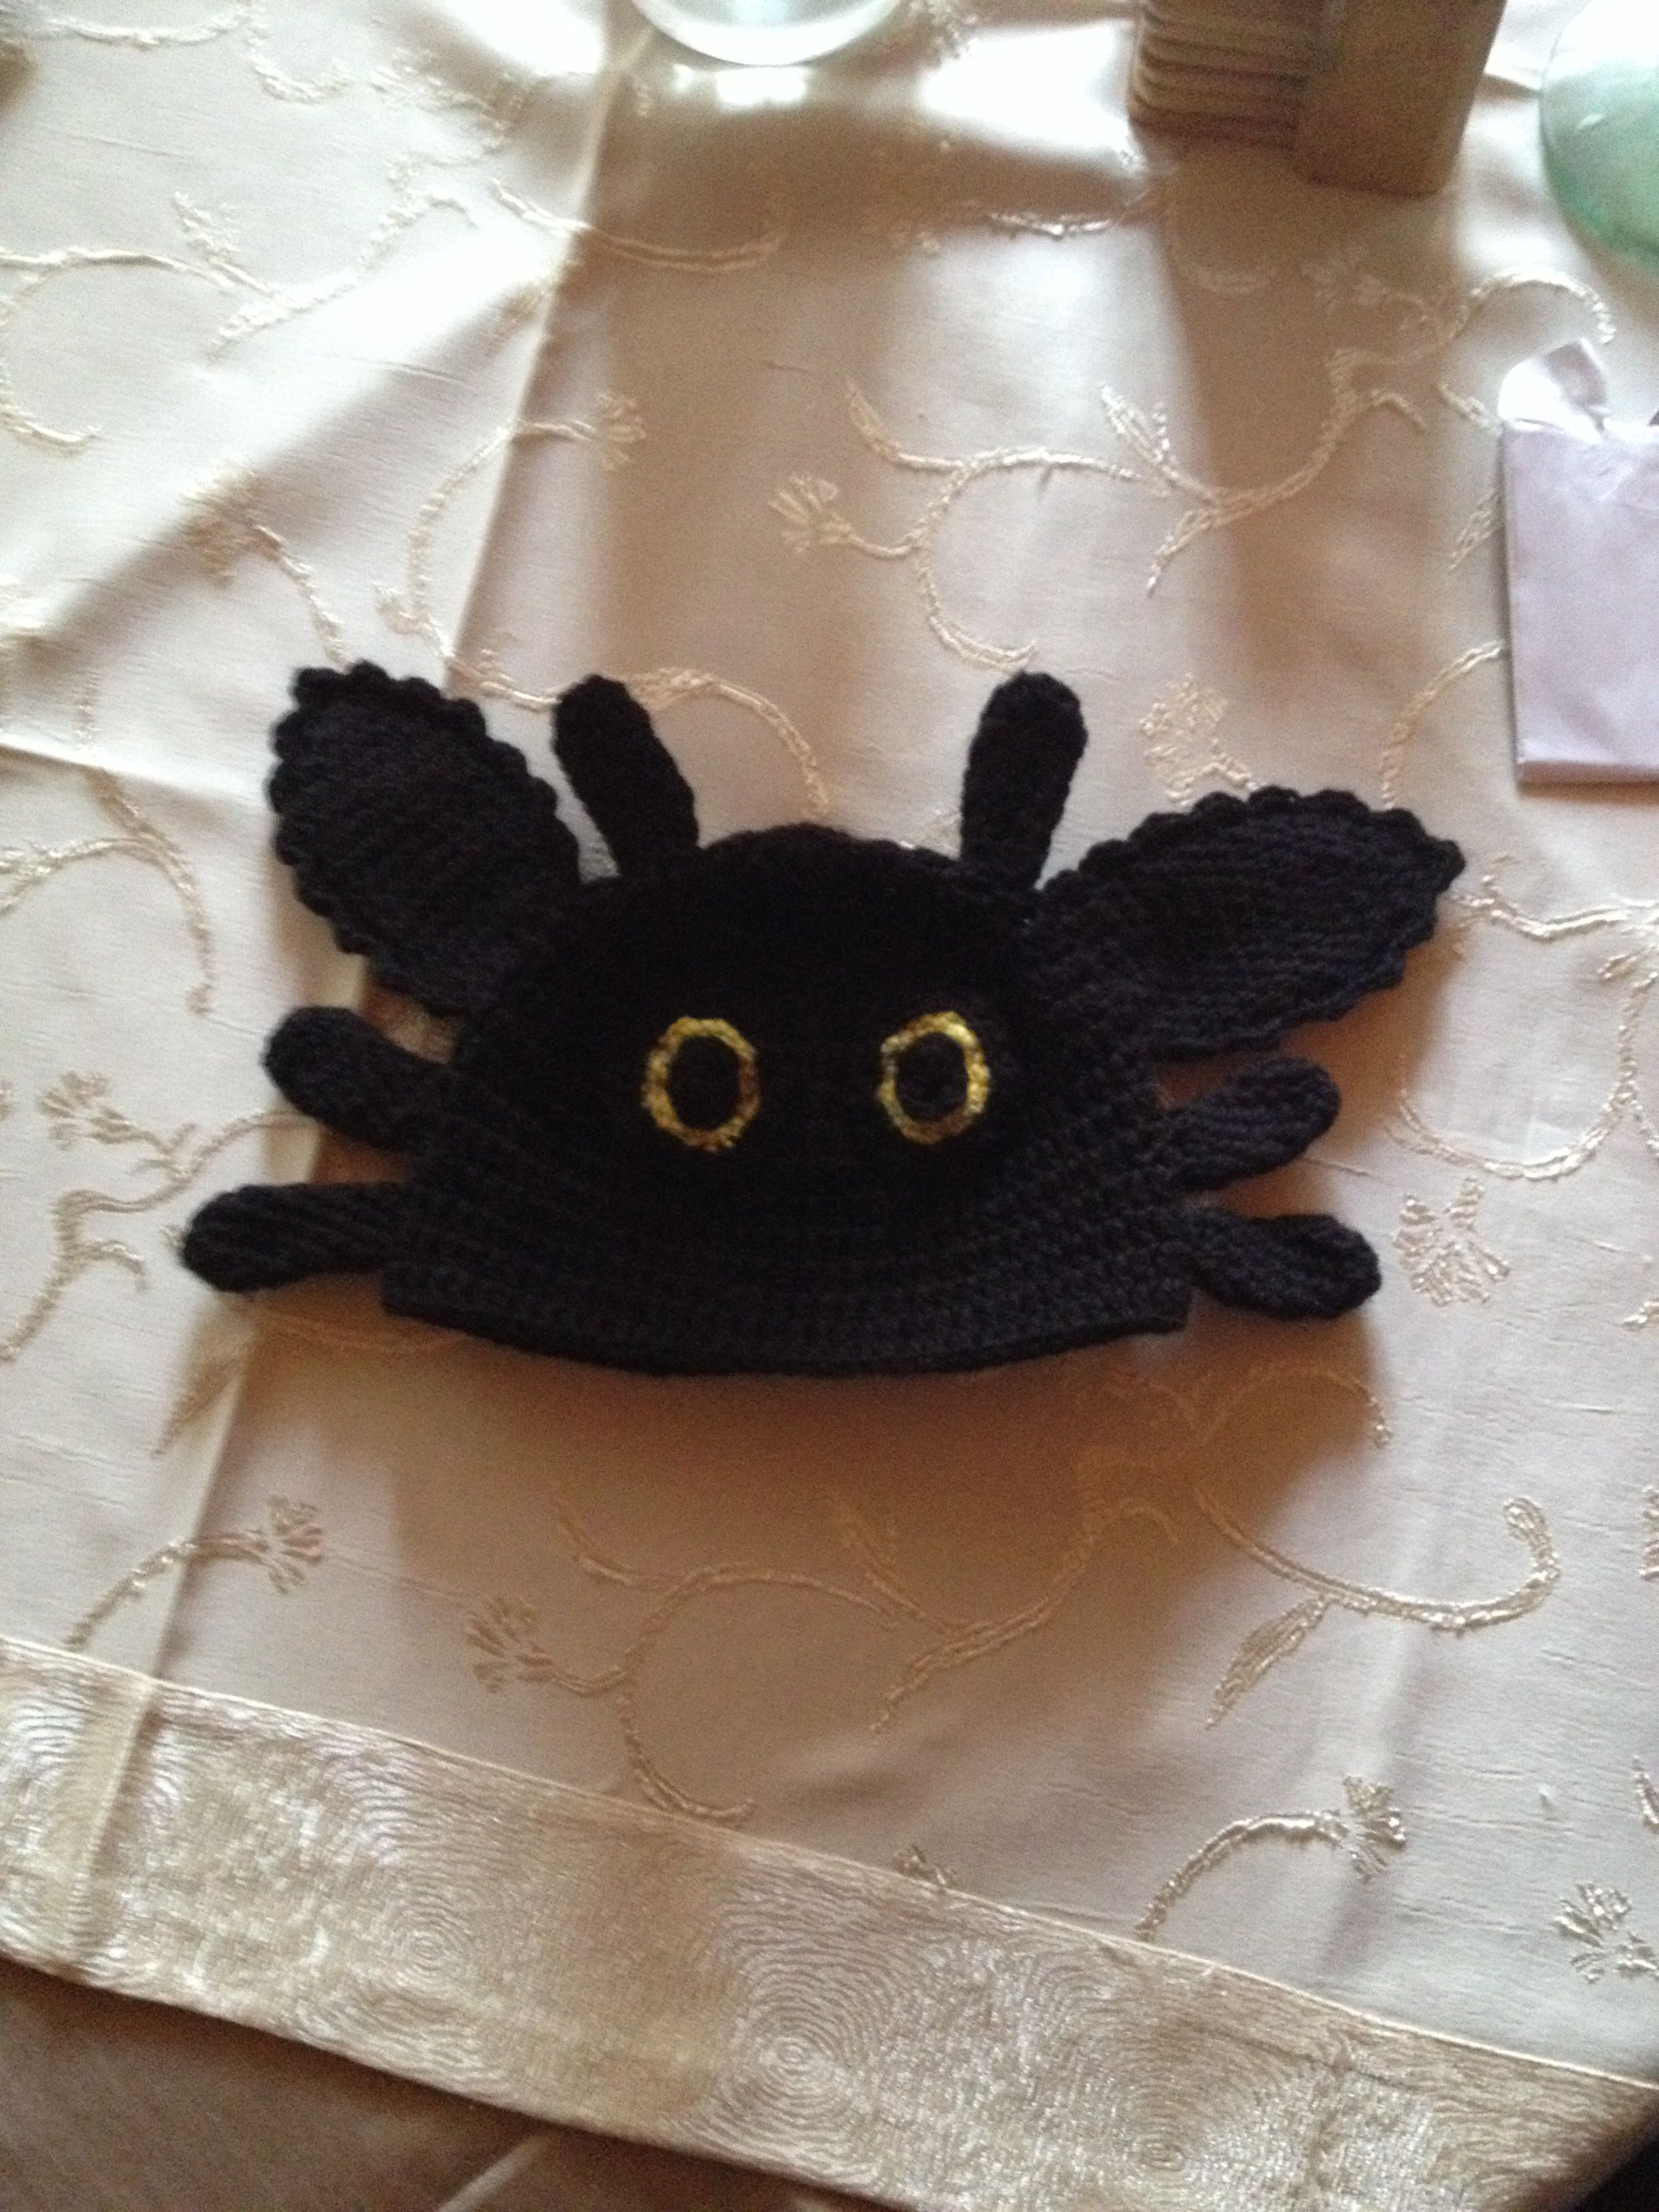 Toothless beanie | Crochet hats, Beanie, Hats